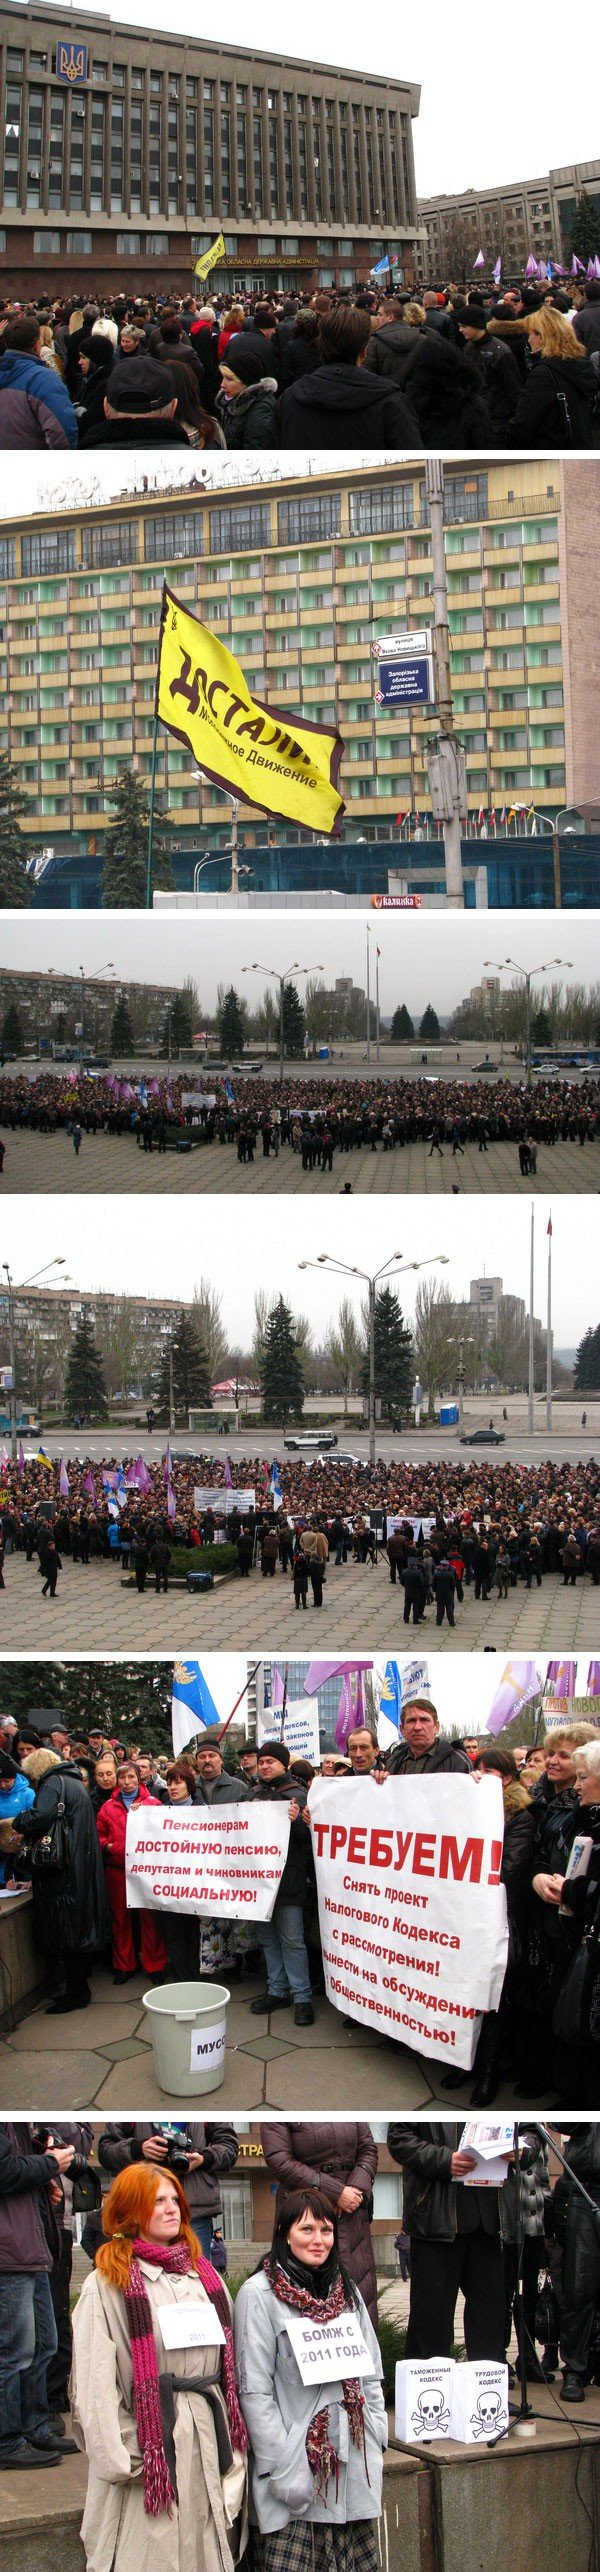 Возле запорожского облсовета митинговали против Налогового Кодекса  (ФОТО), фото-4